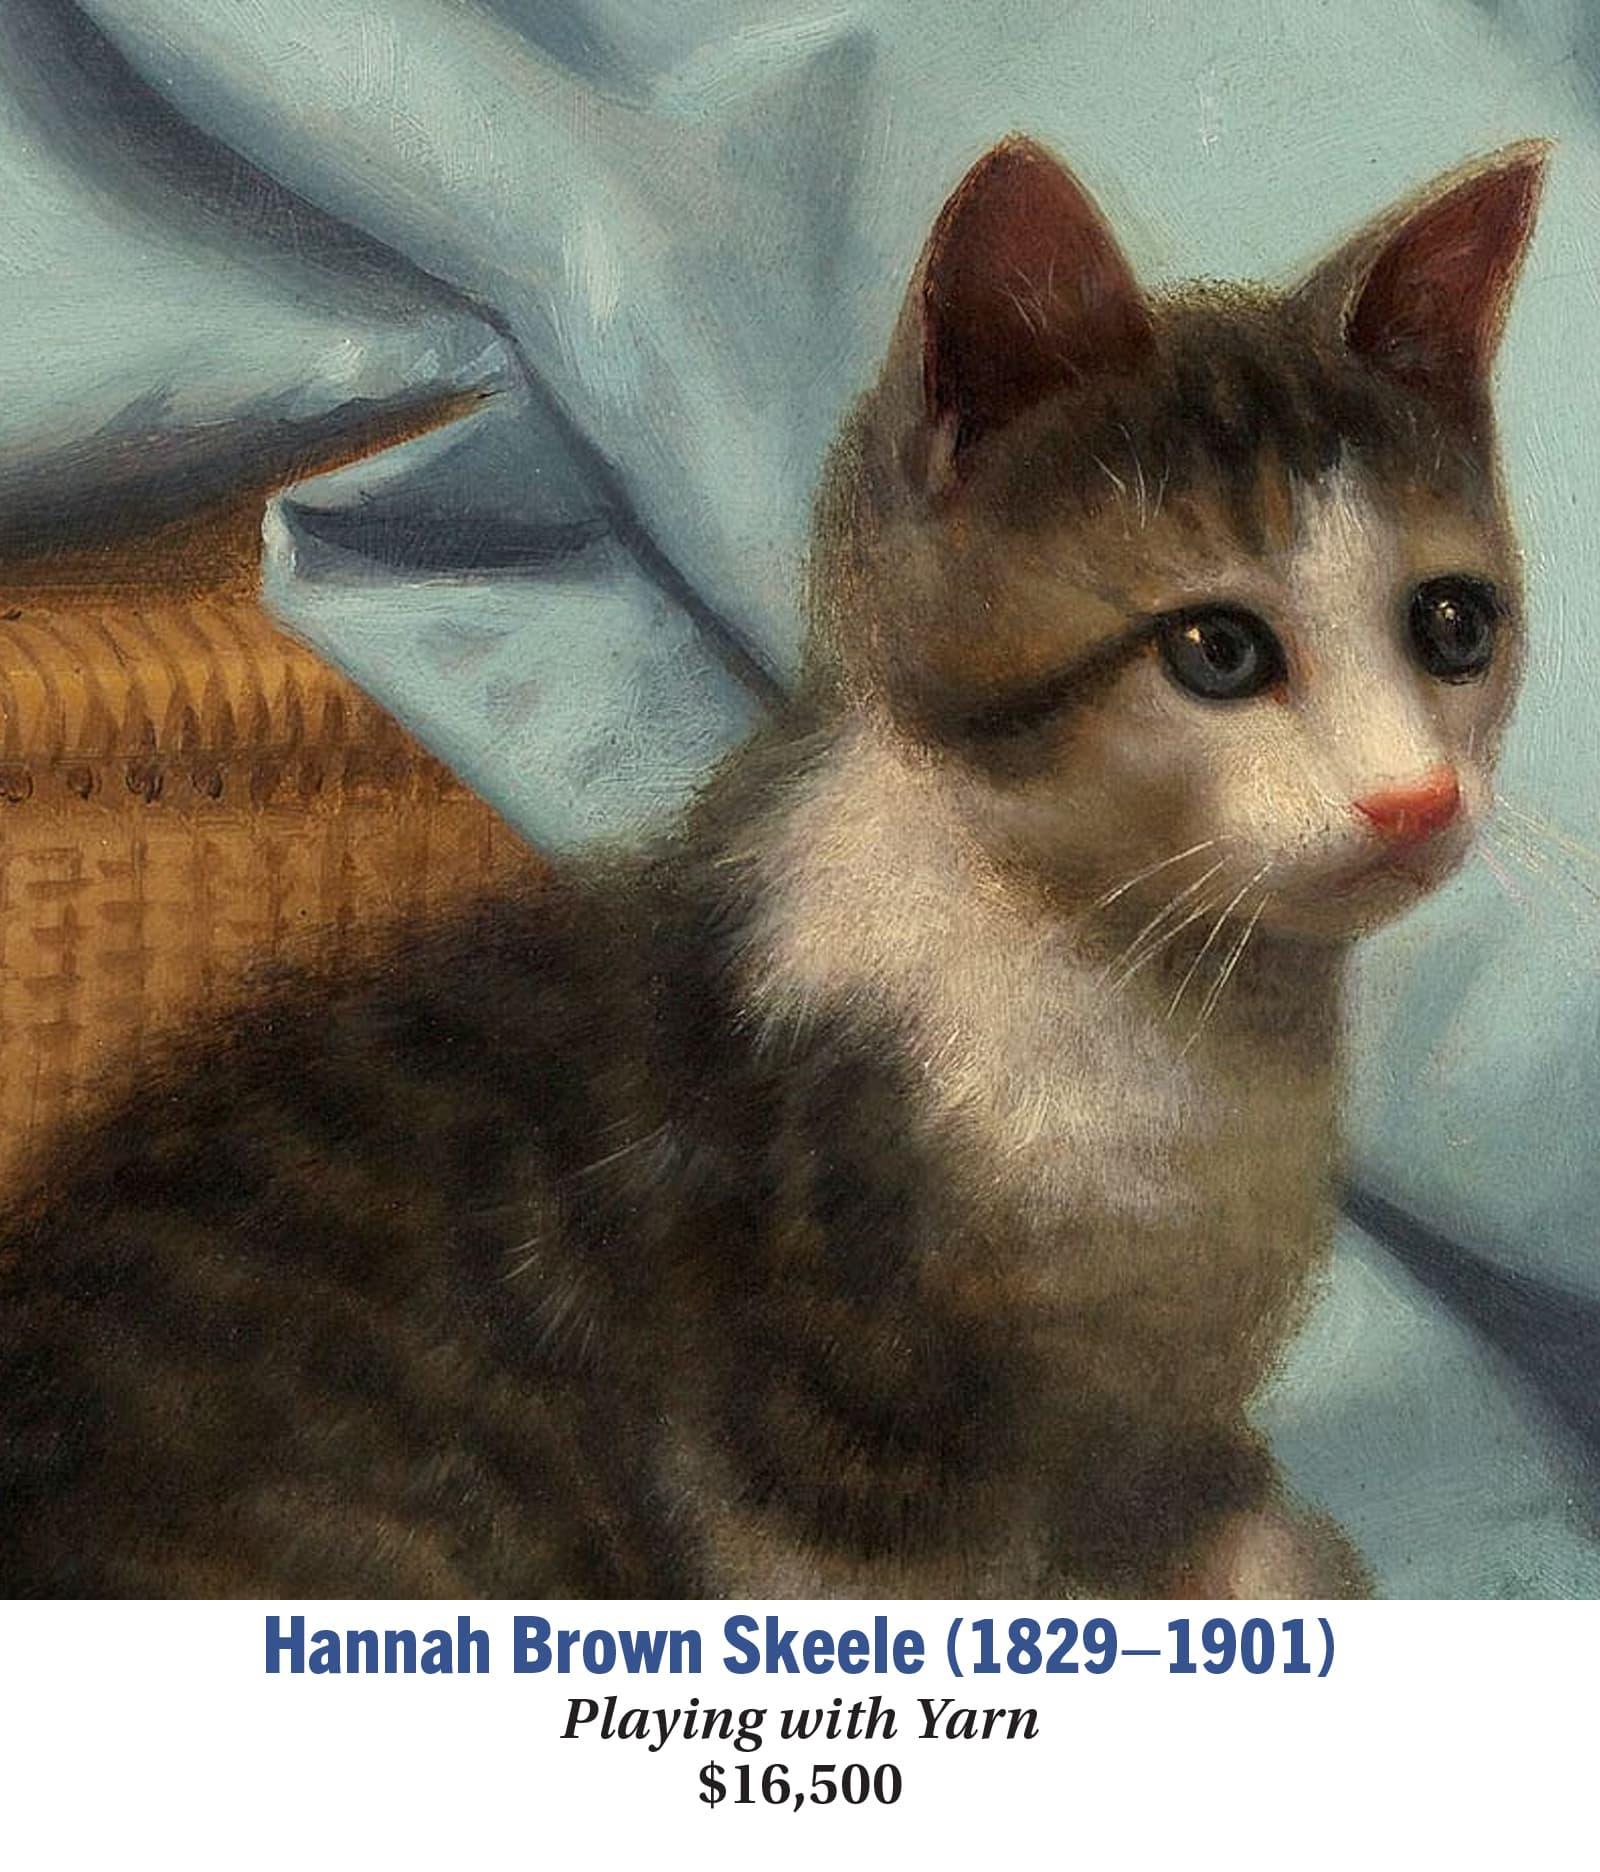 Hannah Brown Skeele (1829–1901), Playing with Yarn, Oil on board, American genre painting, detail image